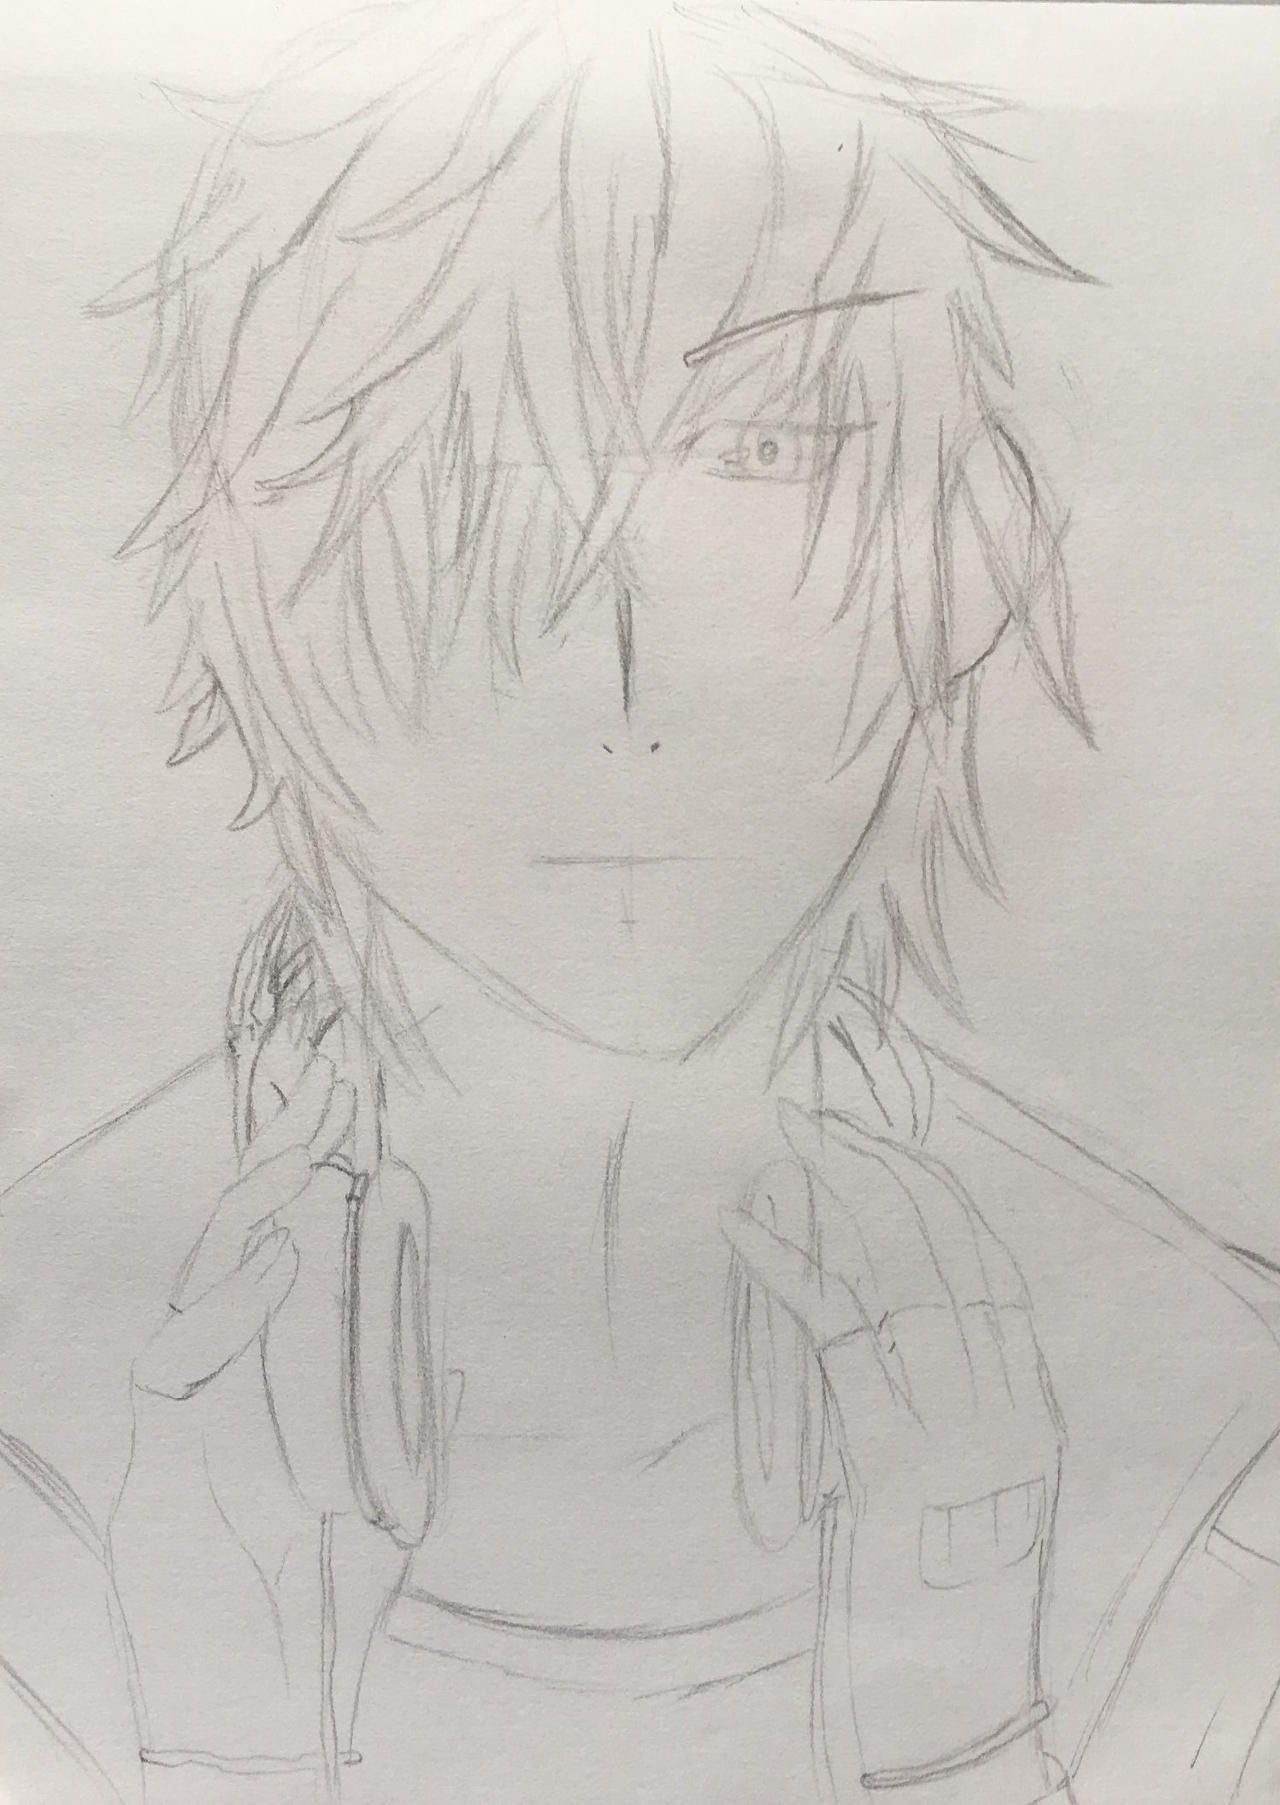 Handsome anime boy with headphones by jexa heinlein on